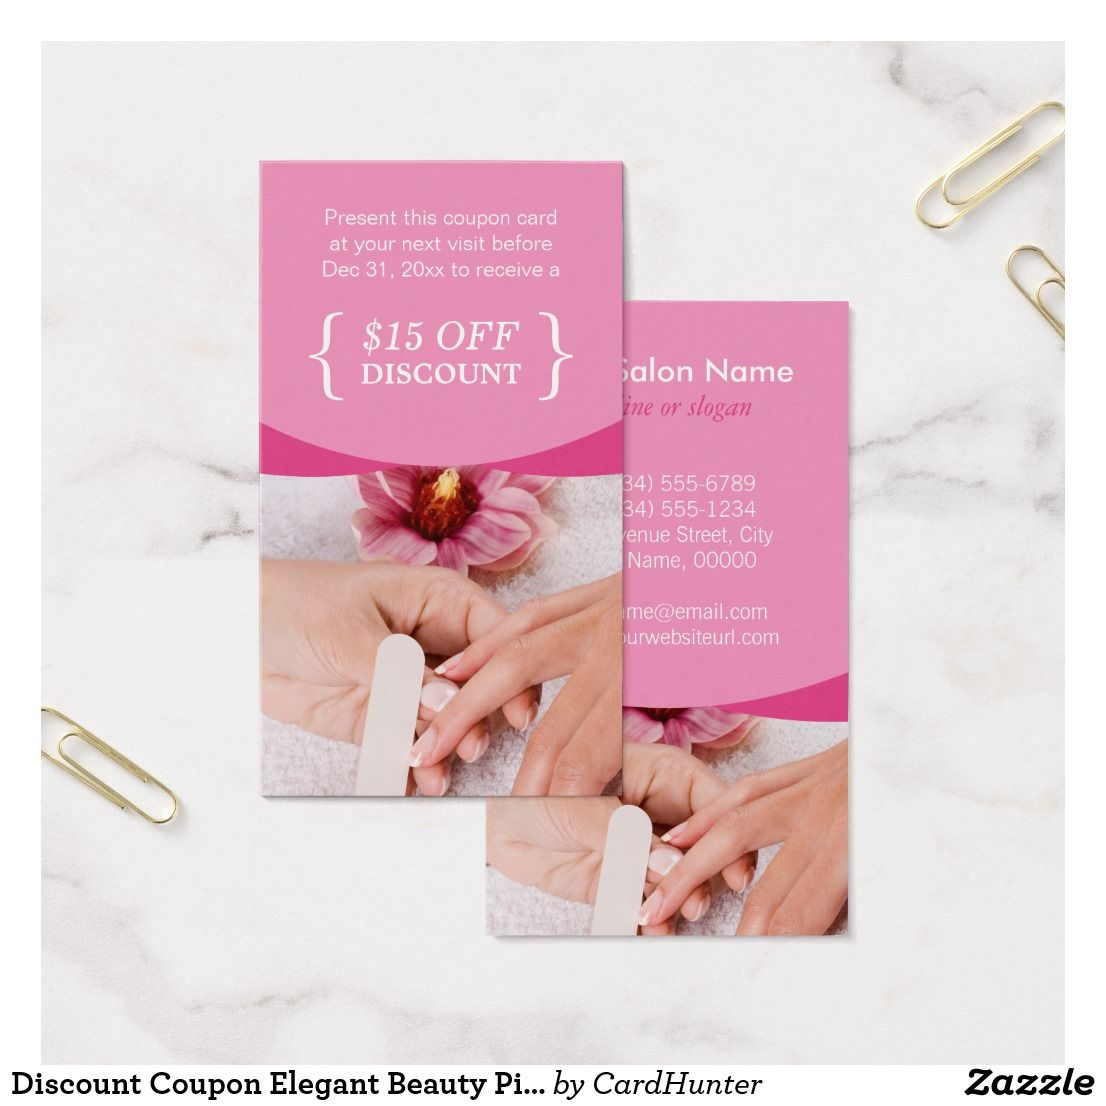 Discount Coupon Elegant Beauty Pink Nail Salon Spa Zazzle Com